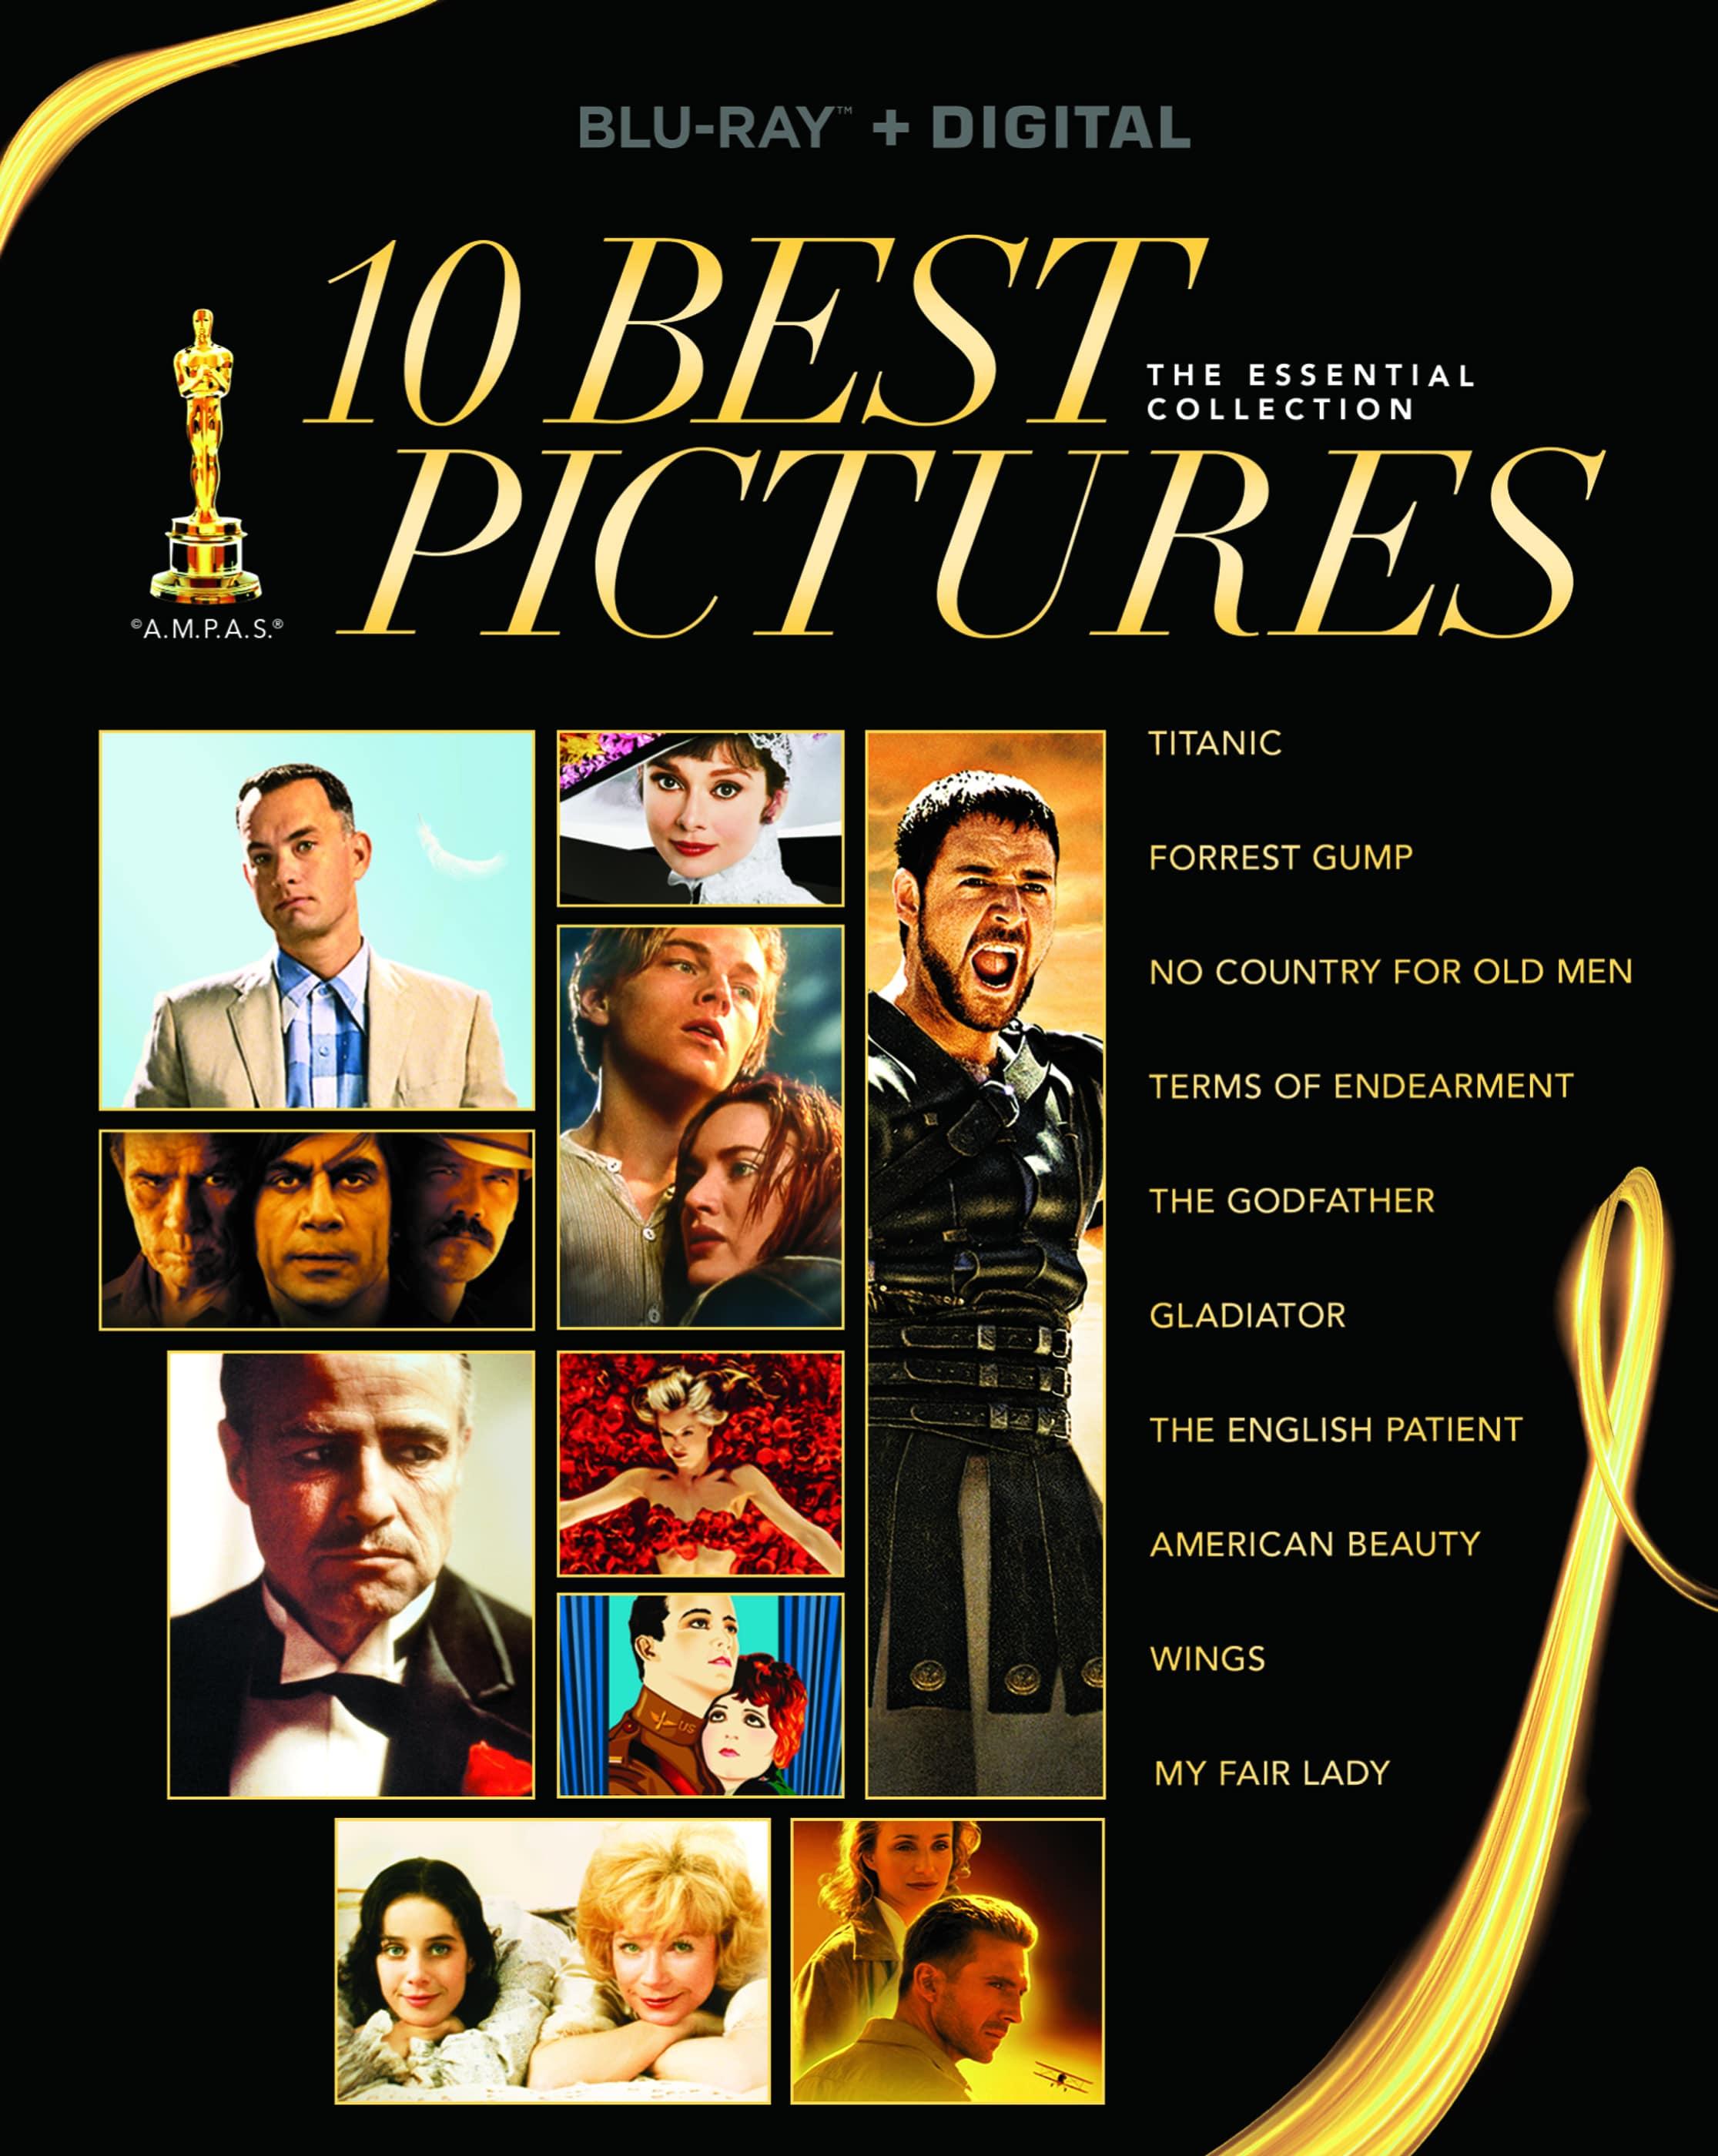 Best Picture Oscars 10 Blu-ray Paramount Miramax